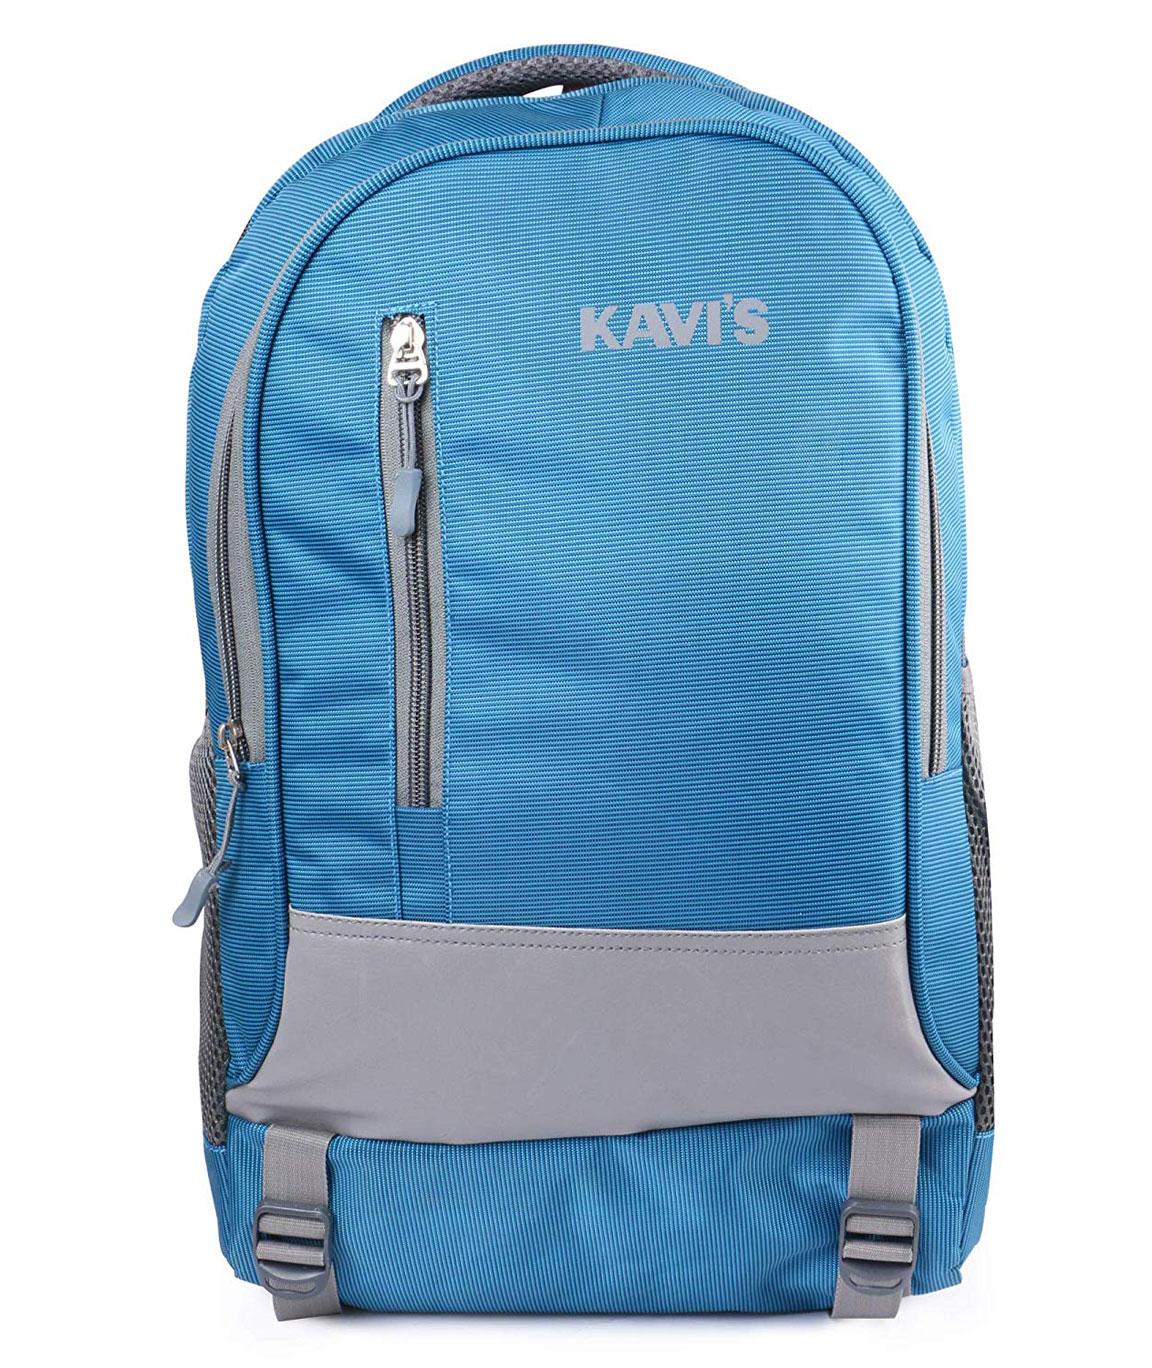 Kavi`s 18 Inch Nylon Polyester Laptop Backpack (sky blue)